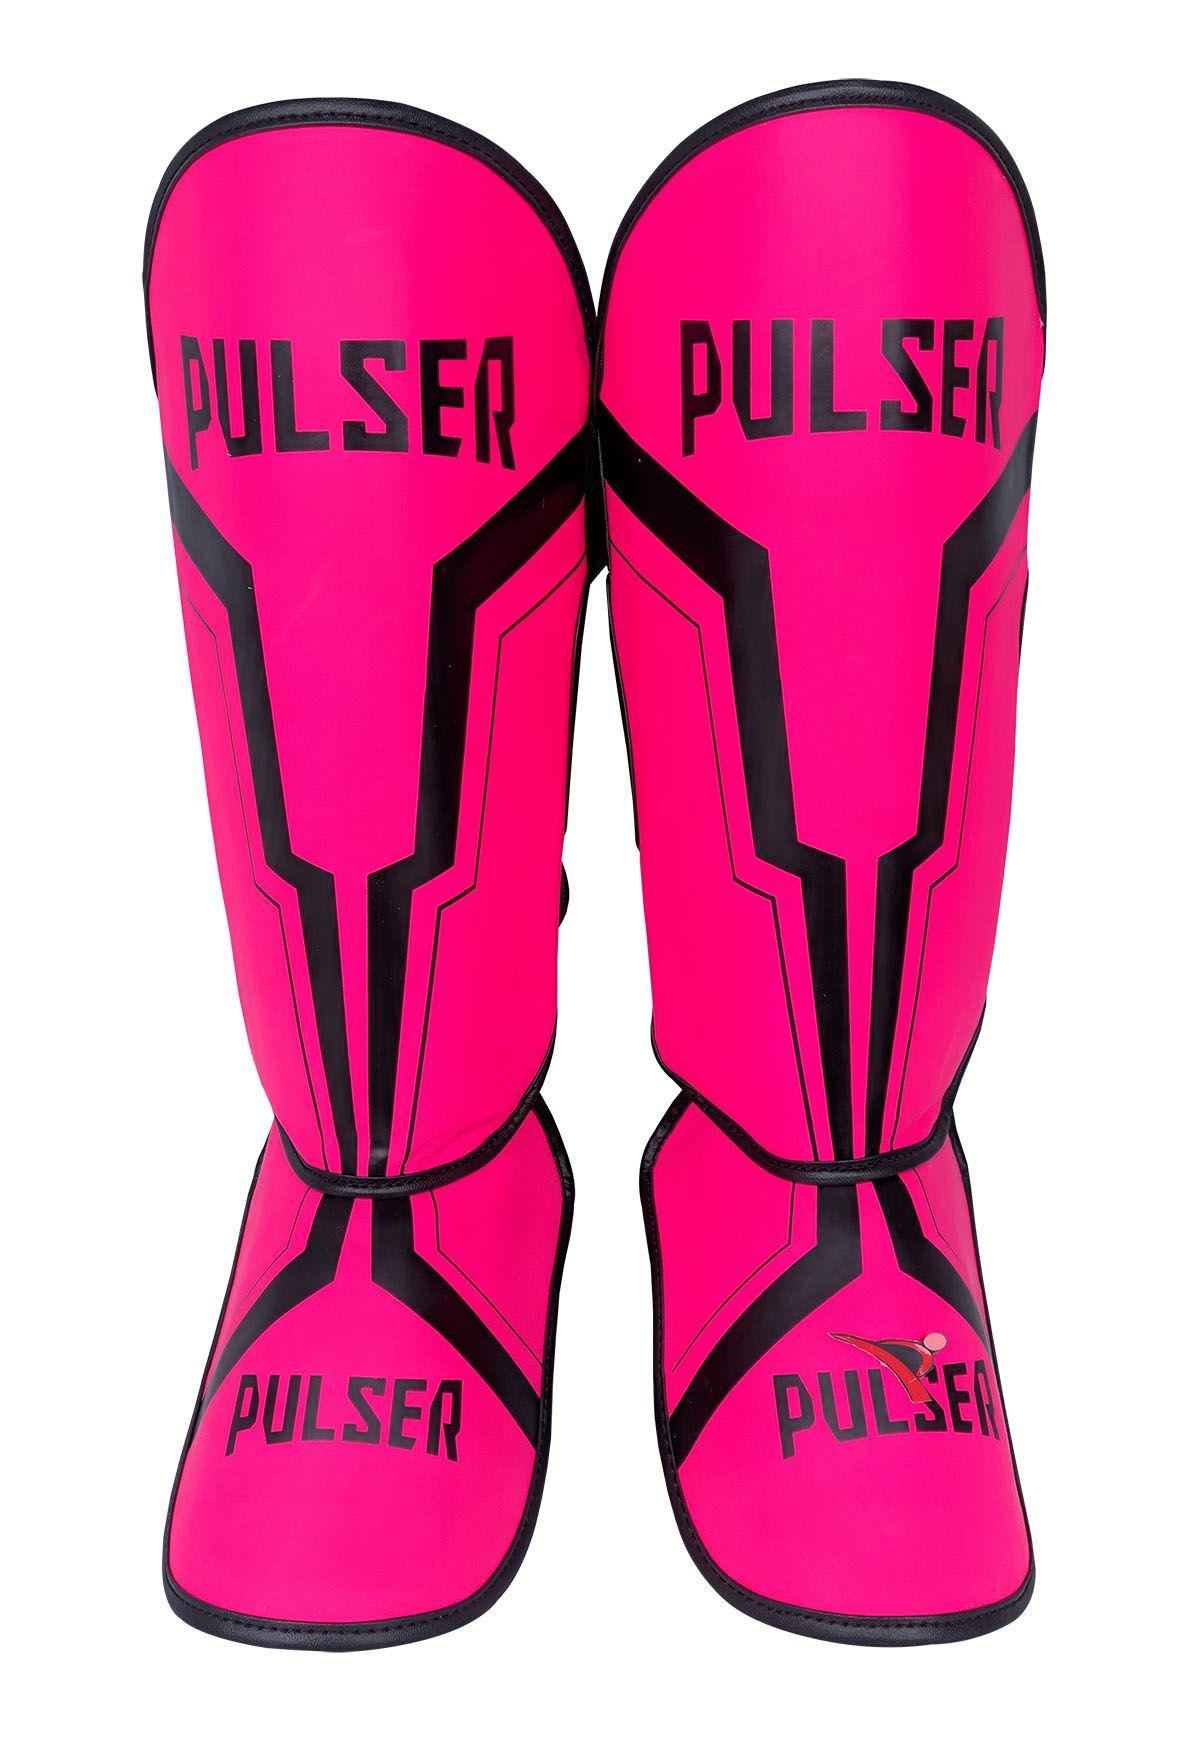 Caneleira Feminina Muay Thai MMA Rosa Iron 20mm - Pulser  - PRALUTA SHOP